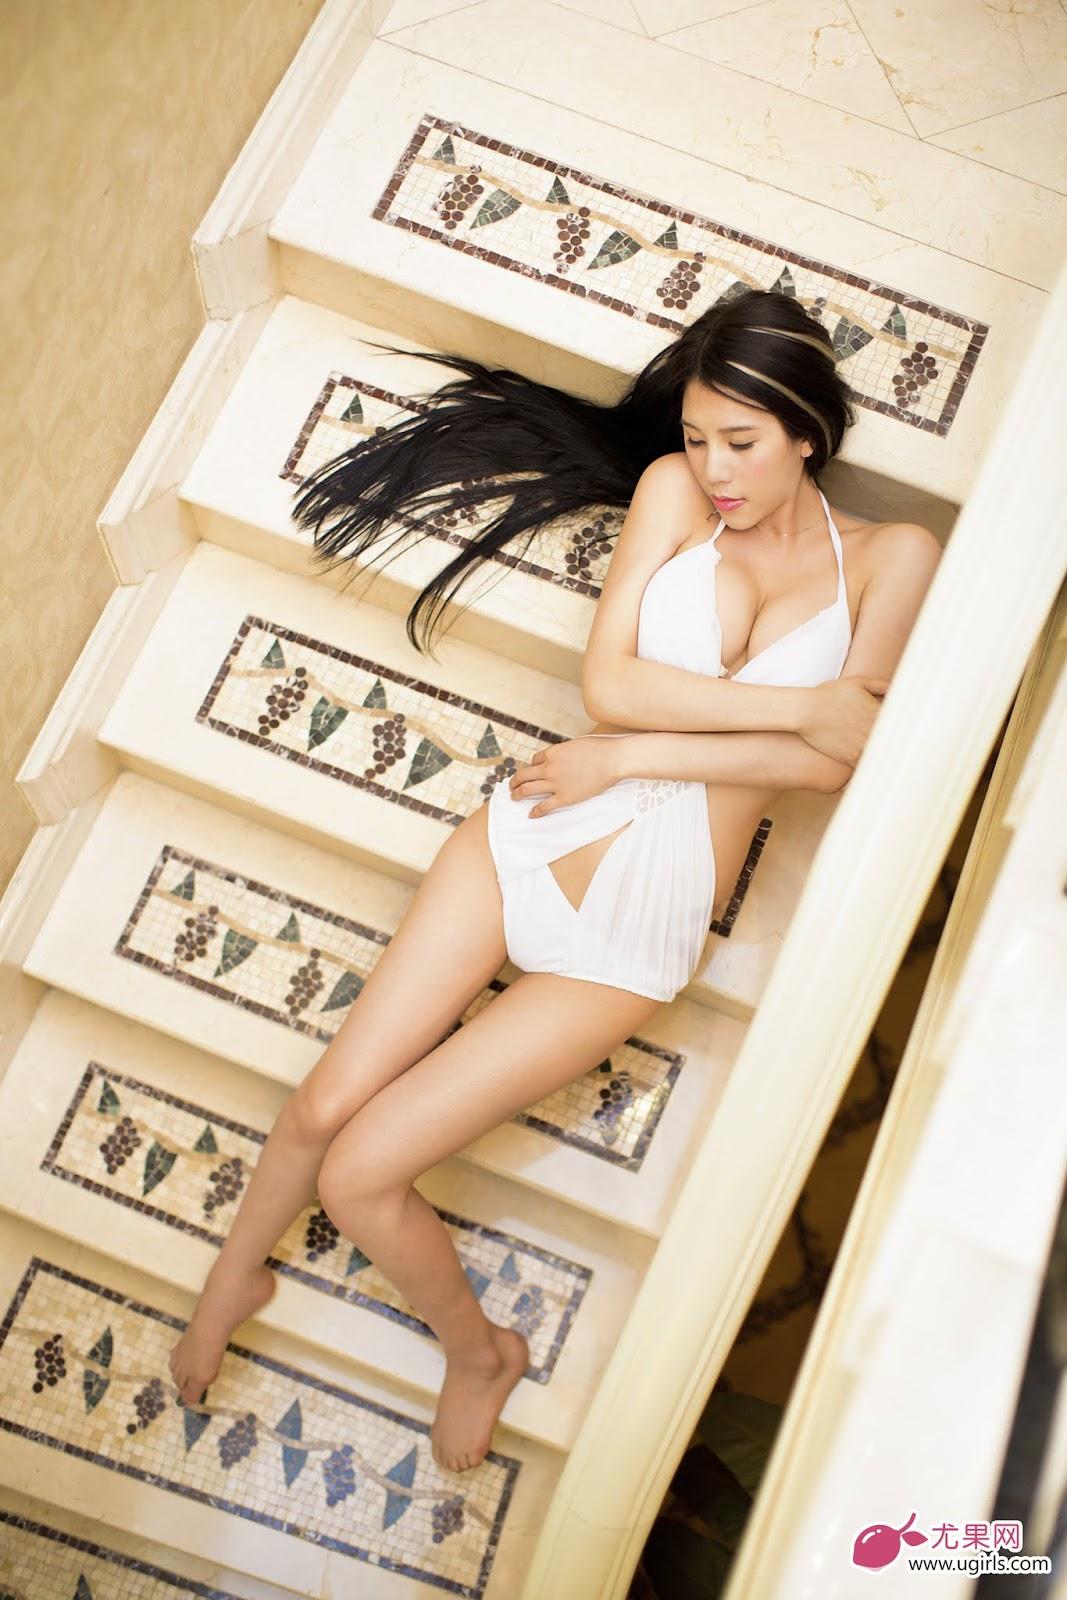 Ugirls No.023 Model: 南湘baby Great Tits